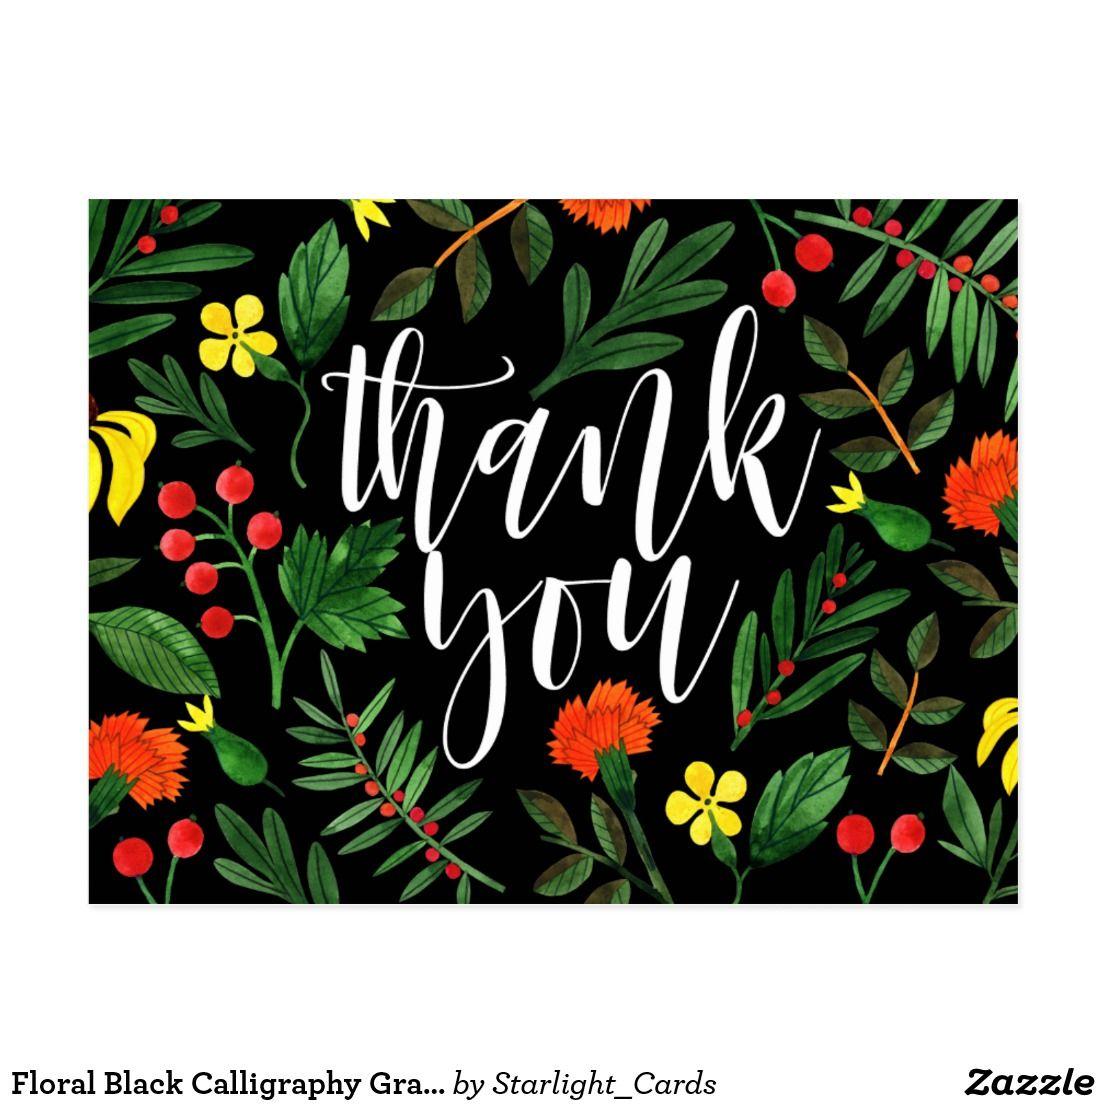 Floral black calligraphy graduation thank you postcard